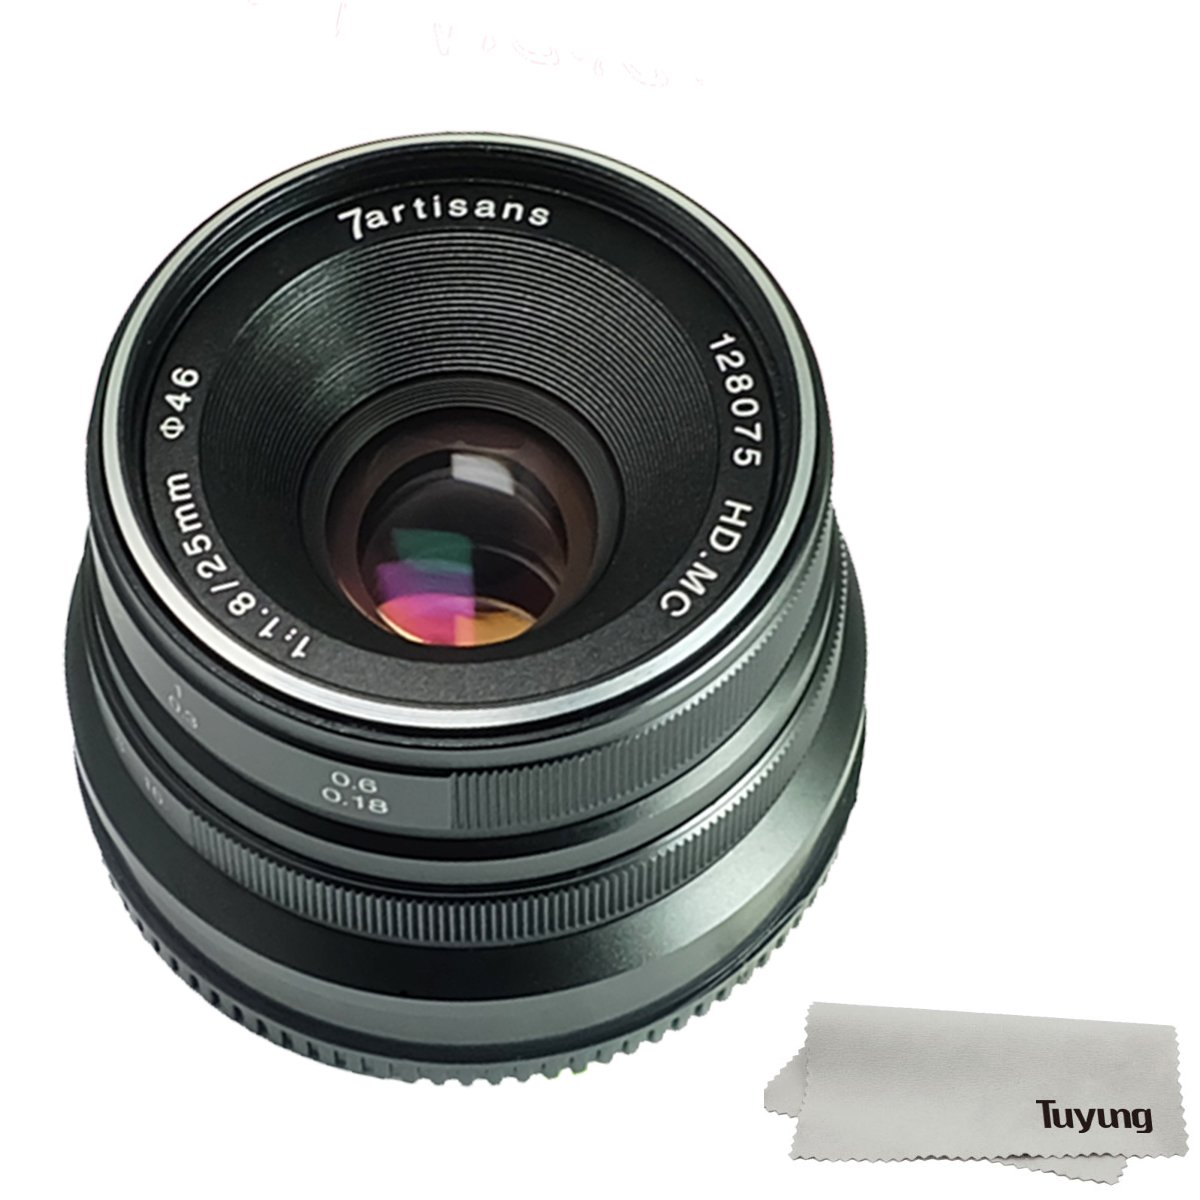 7artisans 25mm F1.8 Manual Focus Lens for Fujifilm Fuji Cameras X-A1 X-A10 X-A2 X-A3 X-at X-M1 XM2 X-T1 X-T10 X-T2 X-T20 X-Pro1 X-Pro2 X-E1 X-E2 X-E2s - Black 25mm F1.8 for Fuji